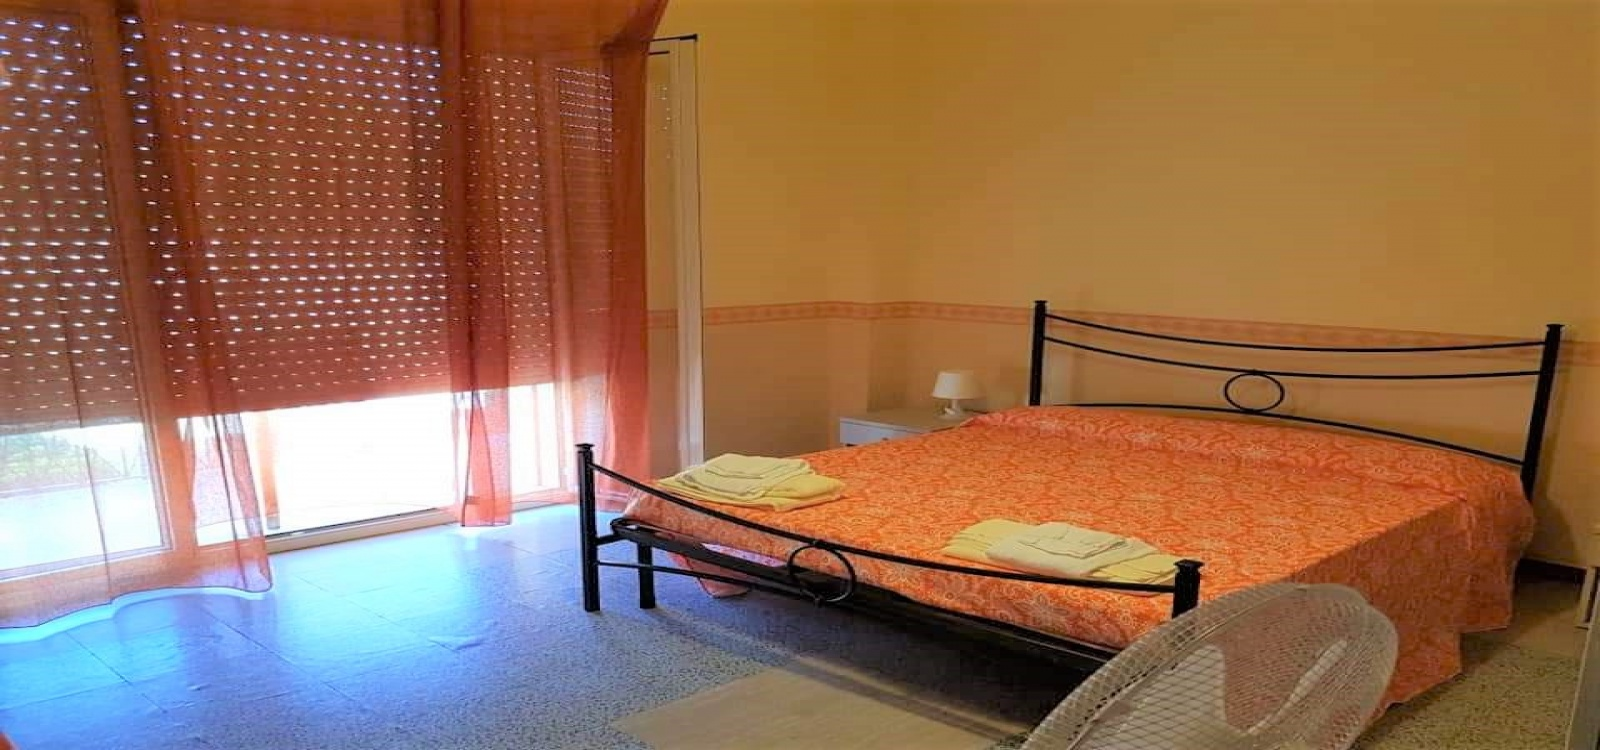 ISOLA,Appartamento,ISOLA,2332